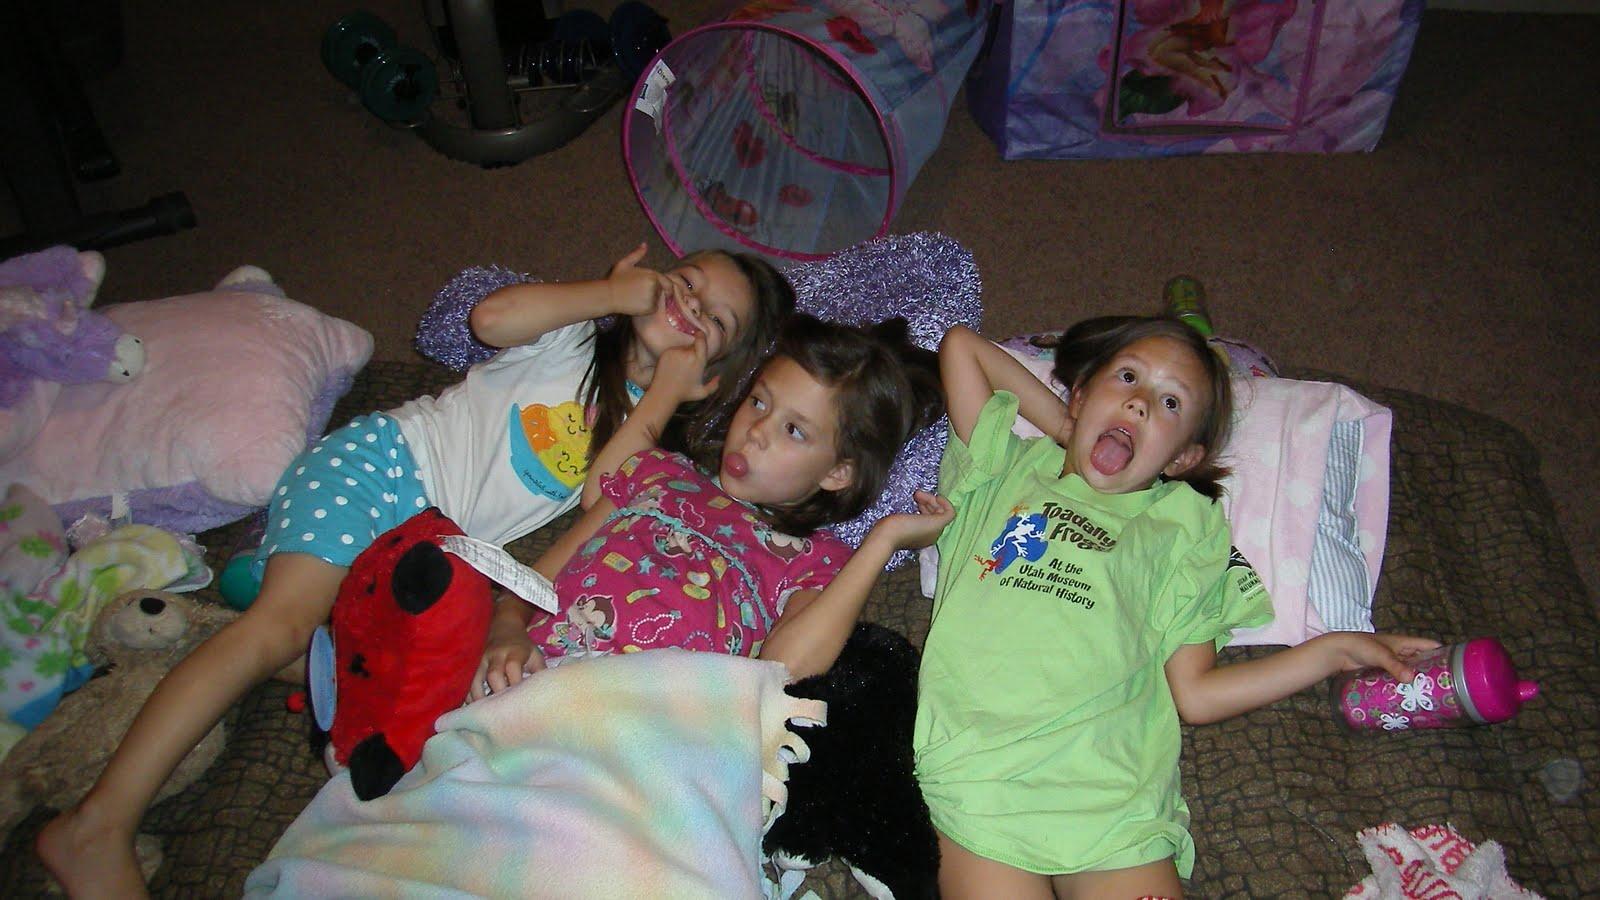 Sleepover little girls